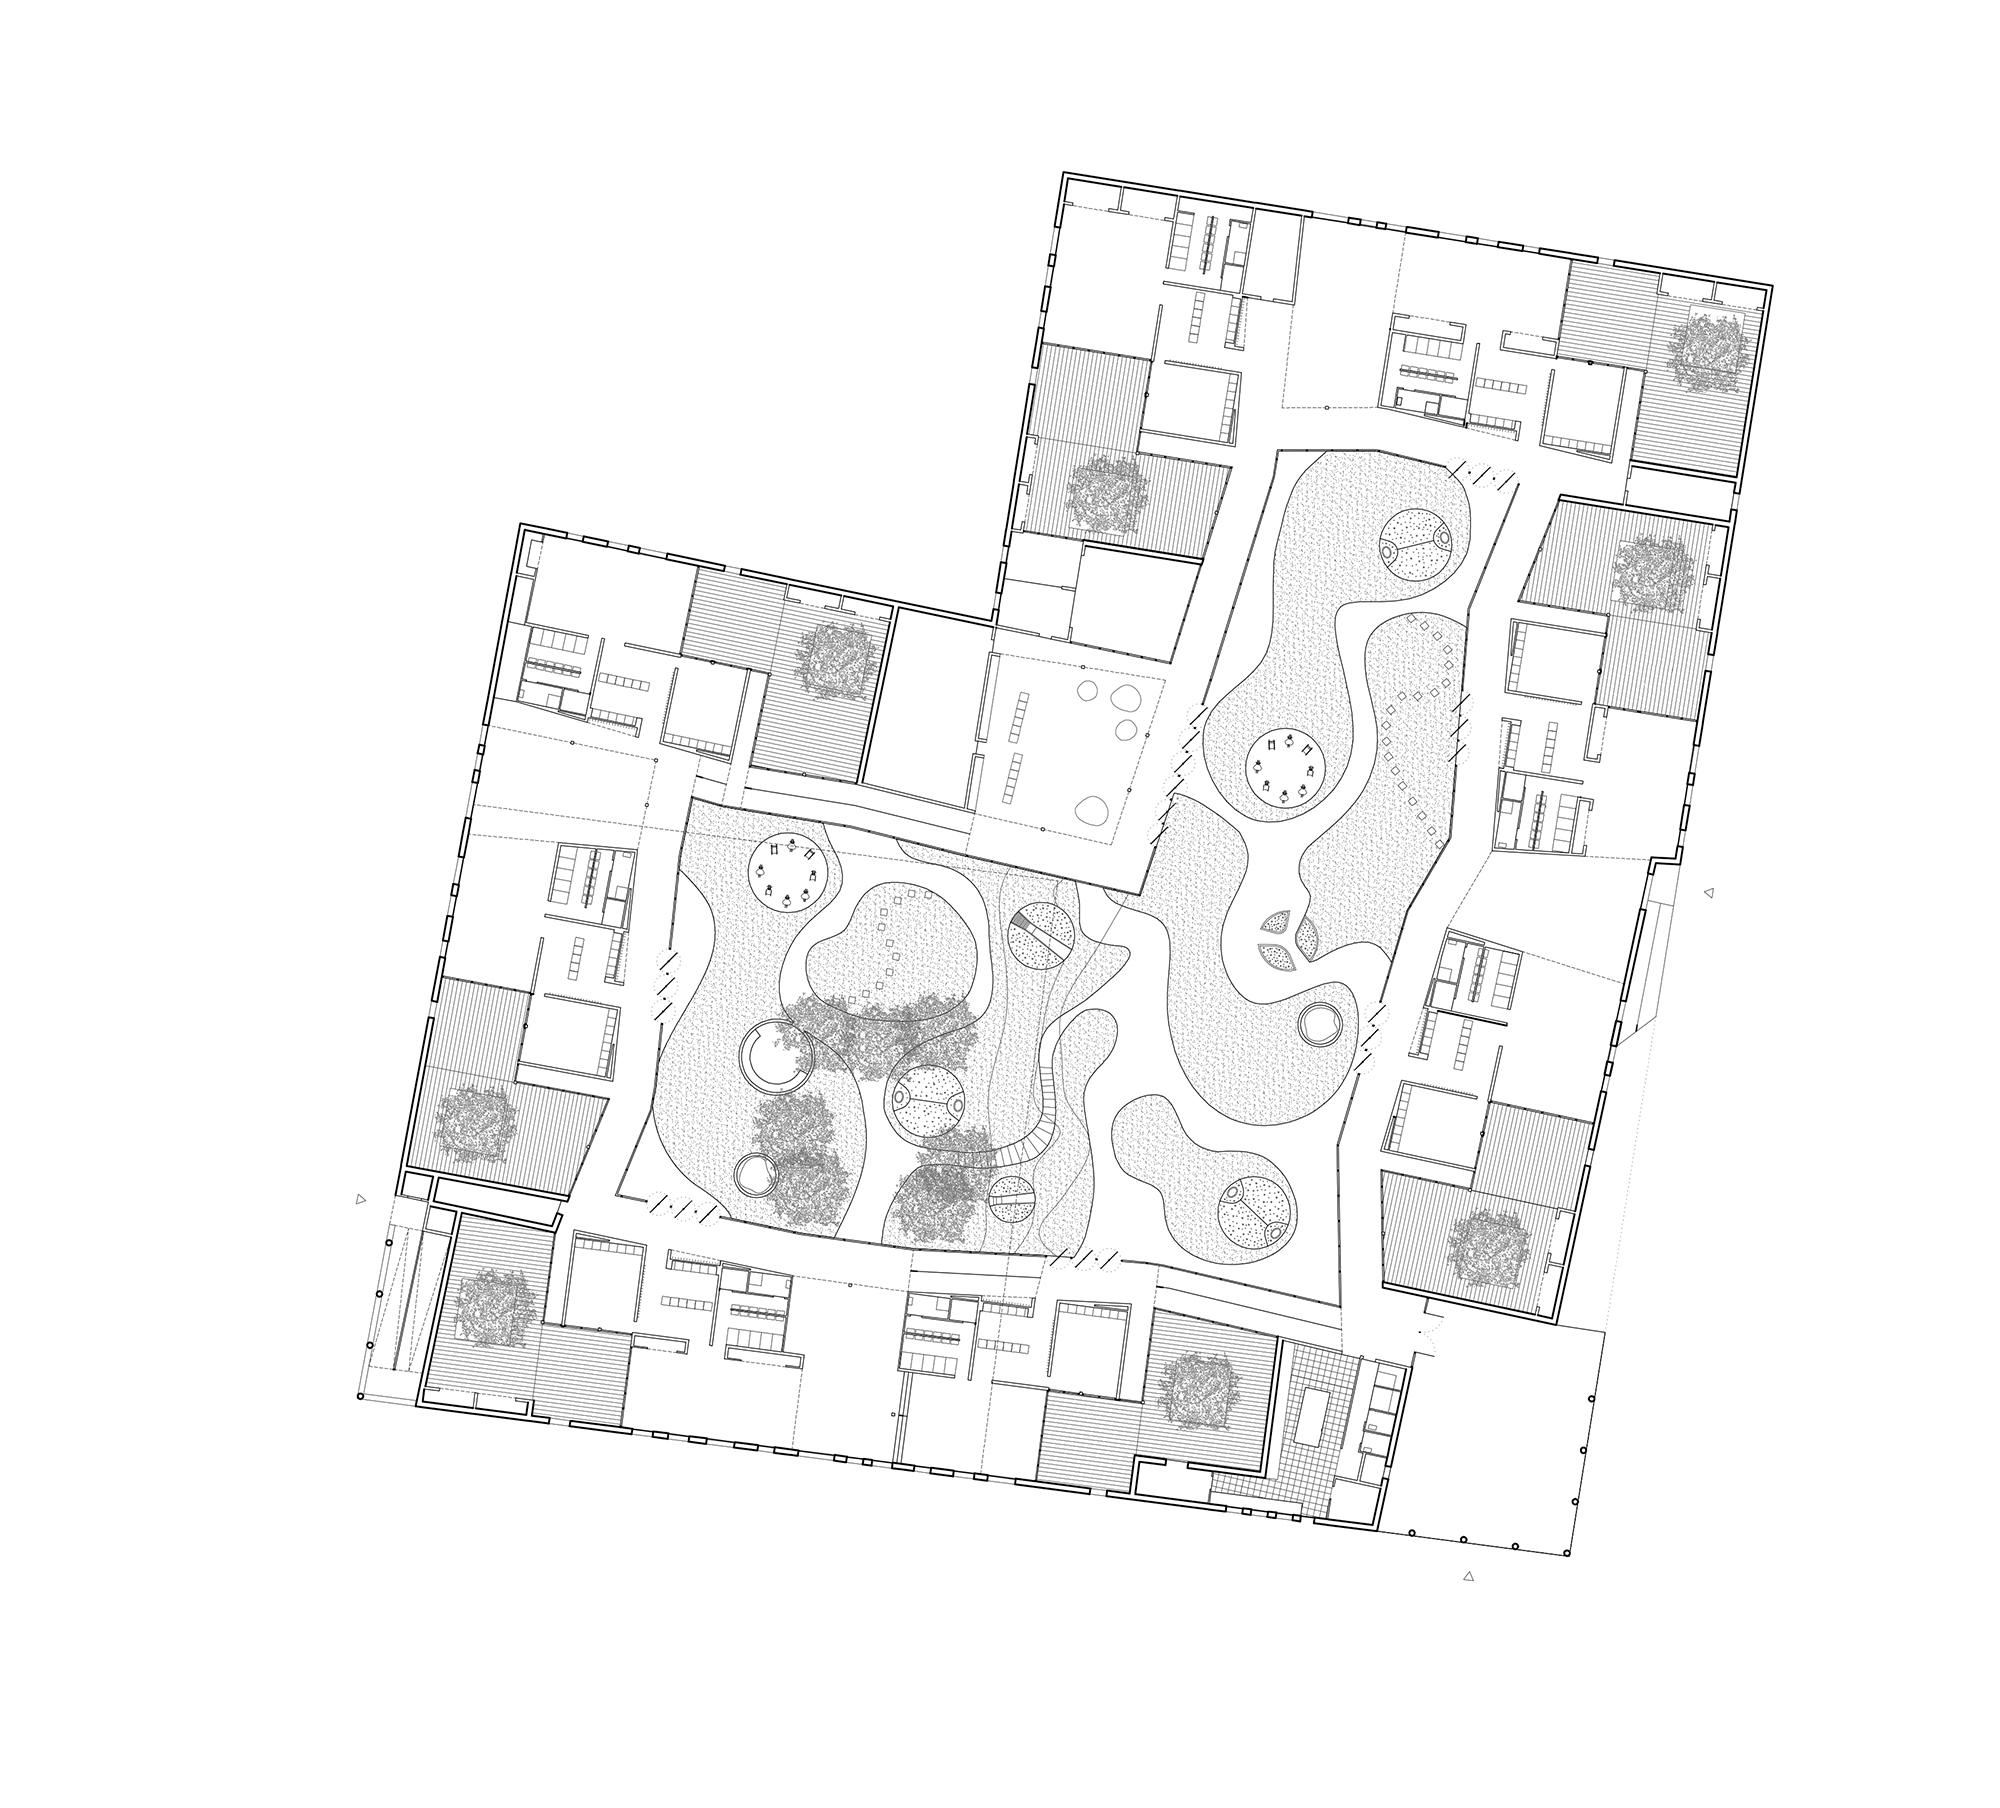 Architektur_offizin-a_gatto.weber.architekten_Projekte_Kultur_HiBaloo_03.jpg